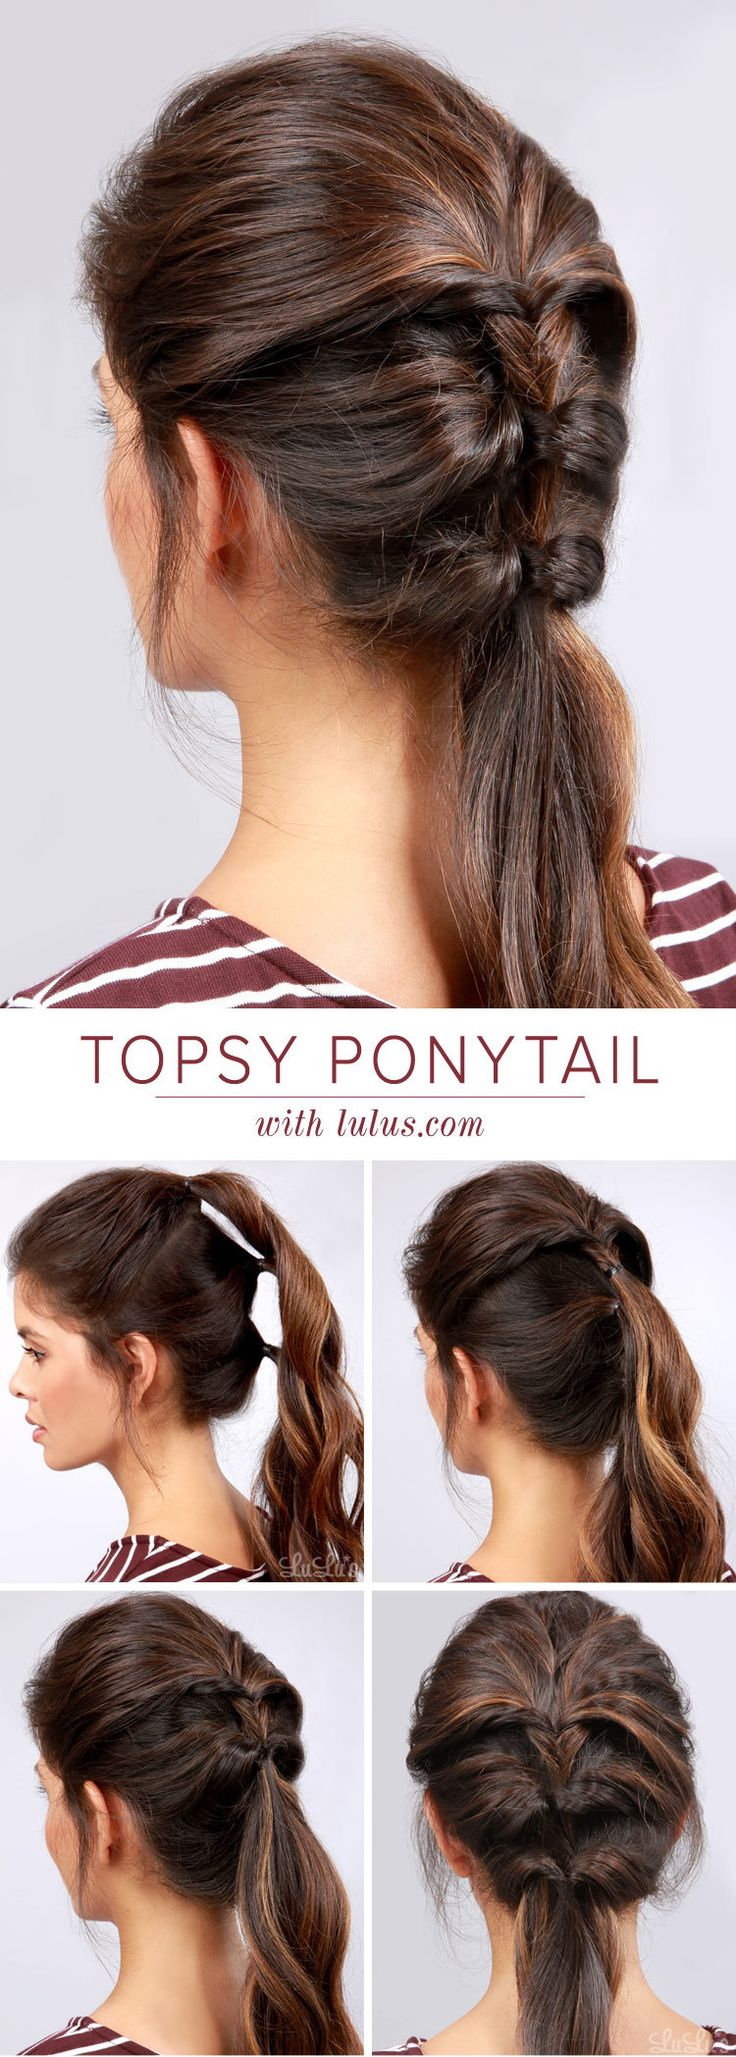 Best 25+ Everyday Hairstyles Ideas On Pinterest